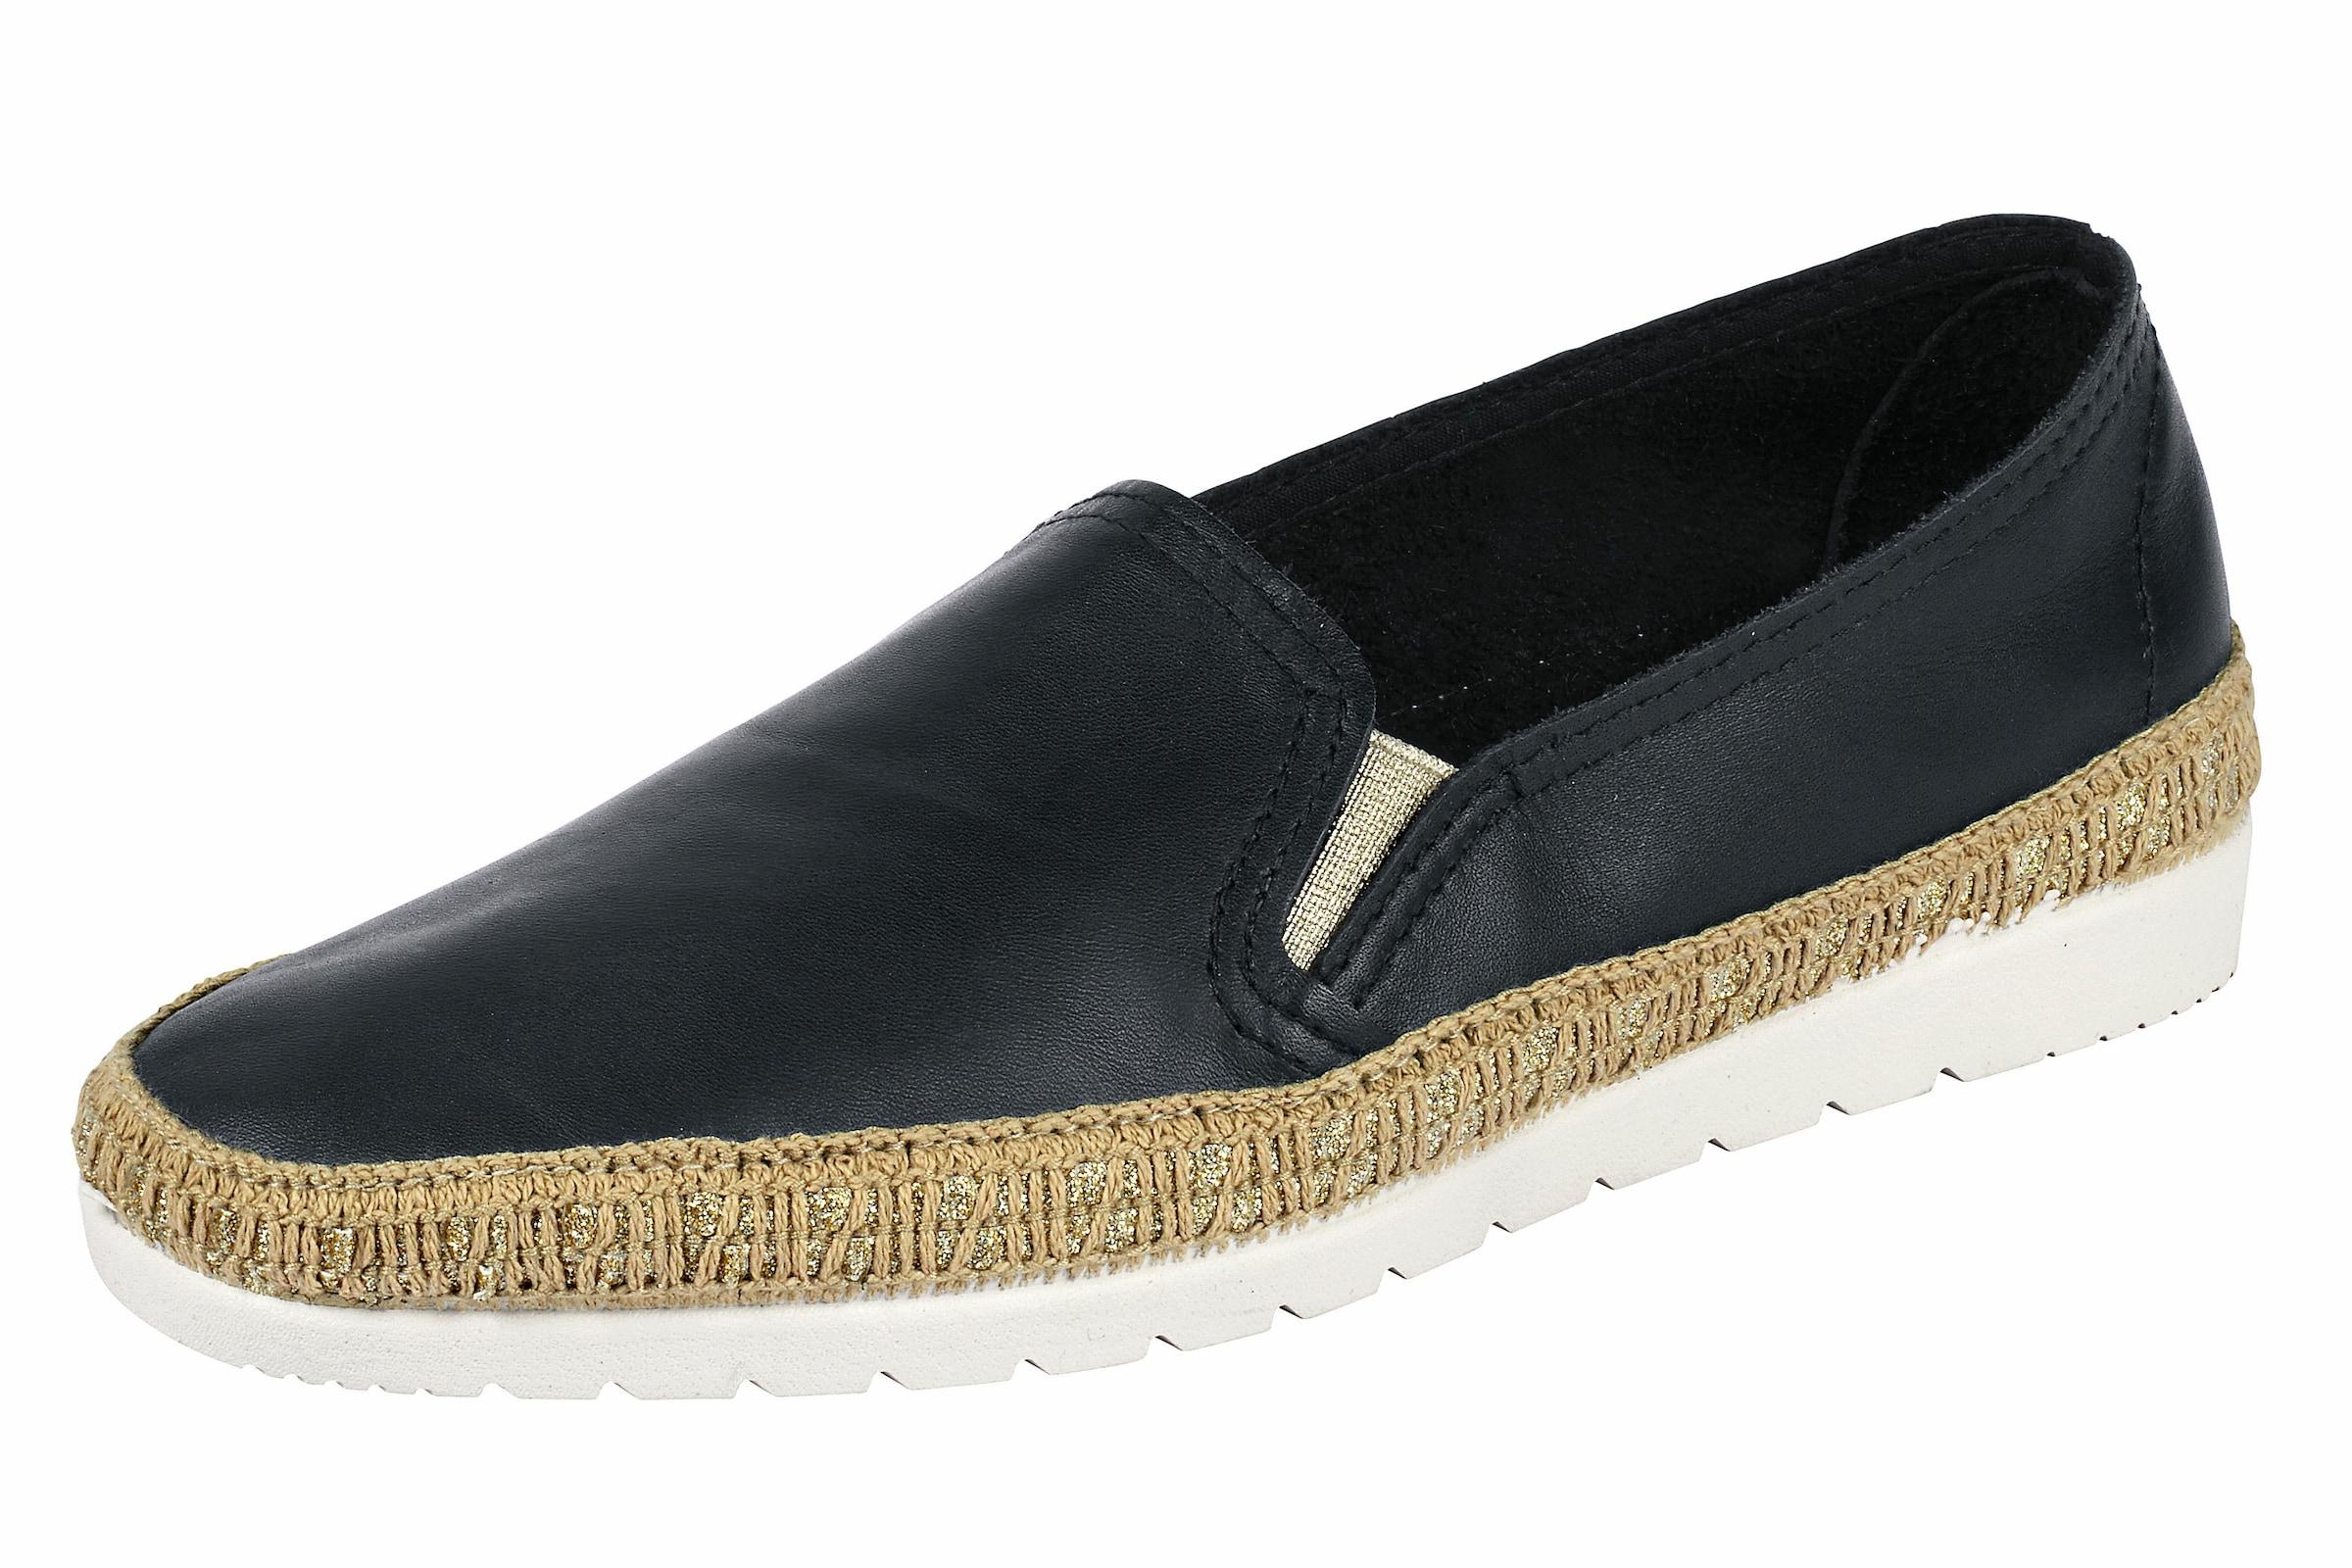 Haltbare Mode billige Schuhe heine | Slipper Schuhe Gut Gut Gut getragene Schuhe 163025